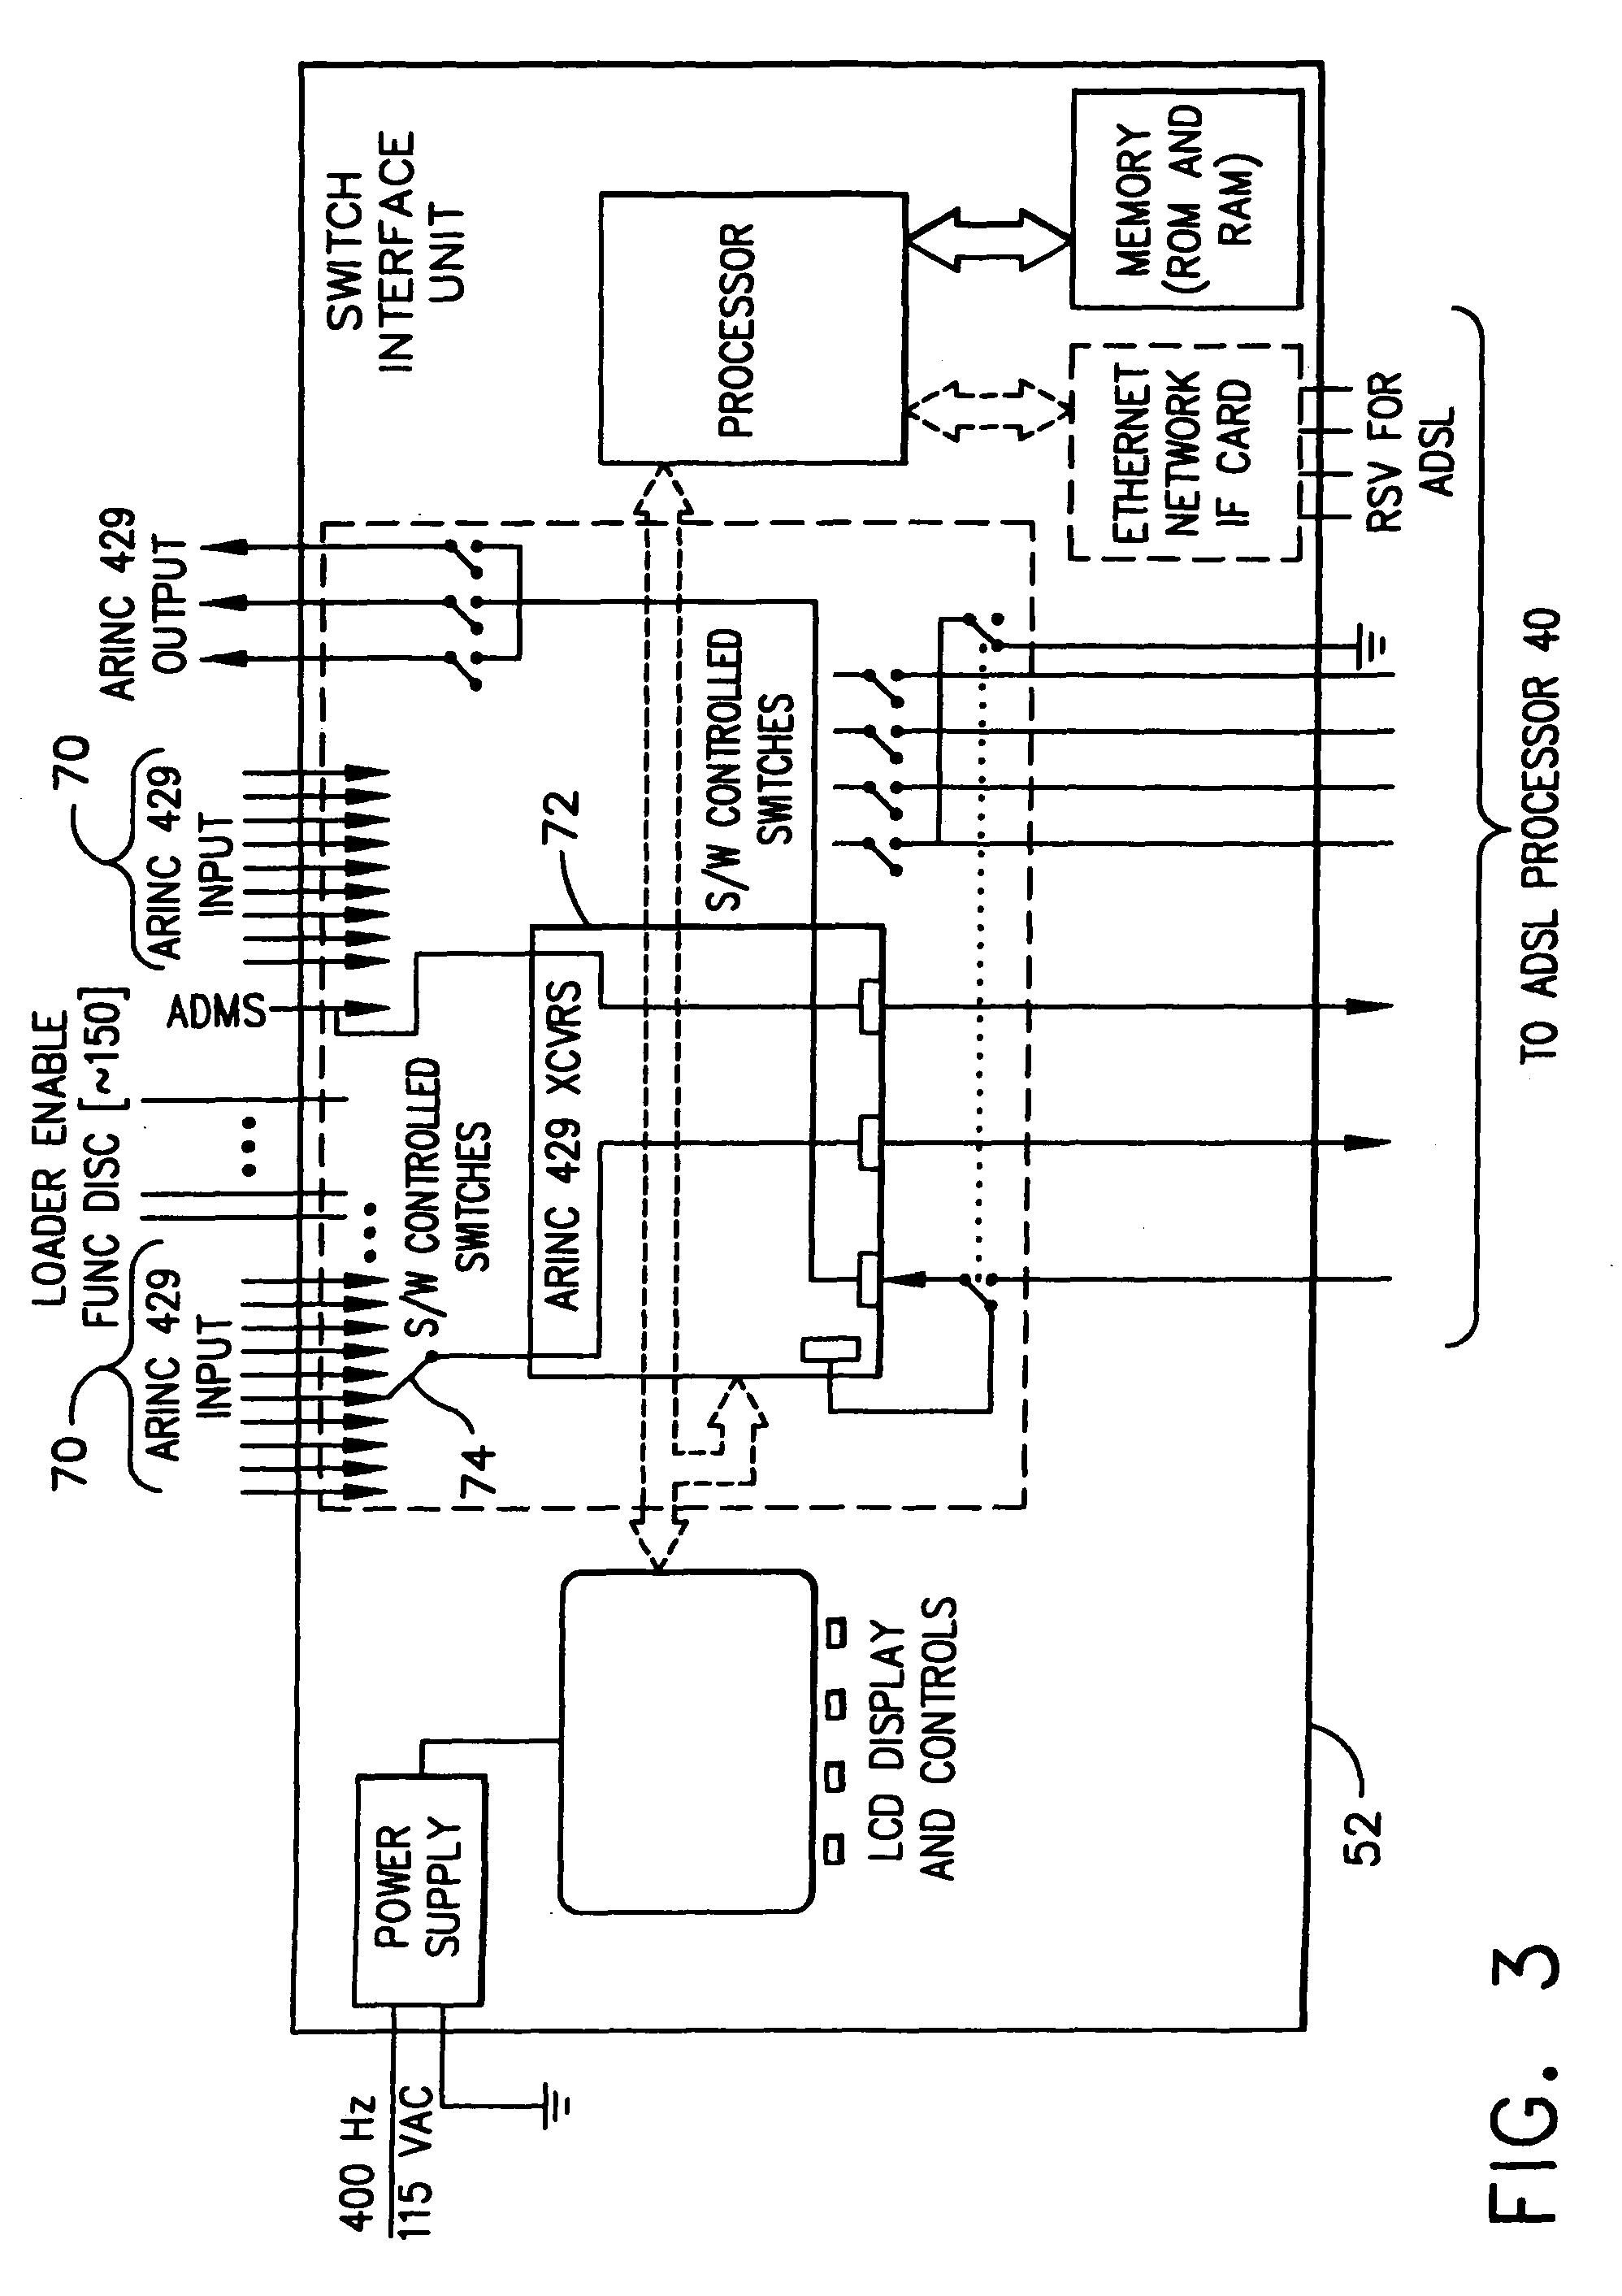 Datatool Alarm Wiring Diagram : Datatool system wiring diagram somurich